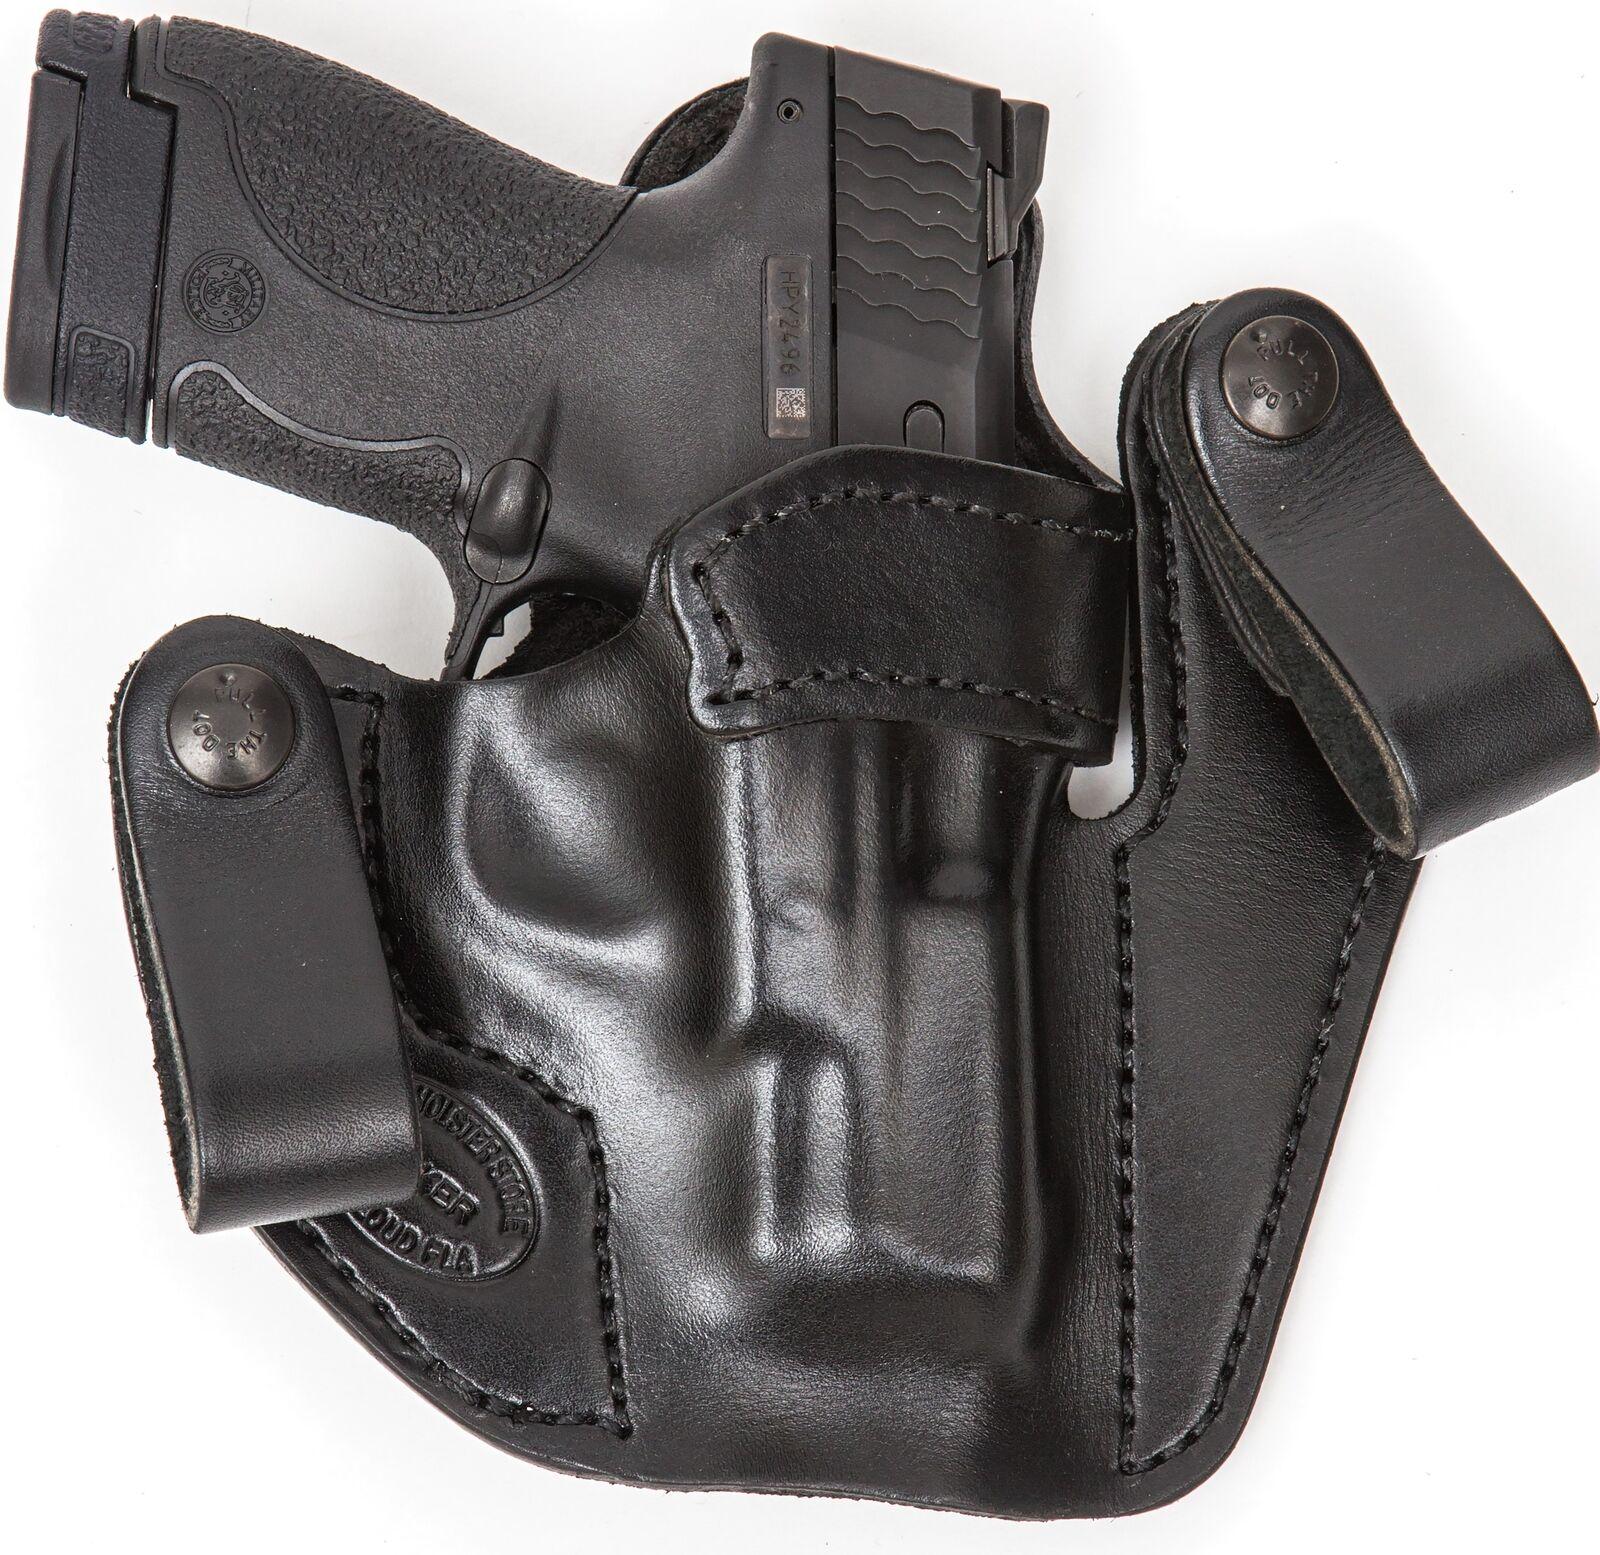 Xtreme llevar RH LH IWB Cuero Funda Pistola para para 1911 4